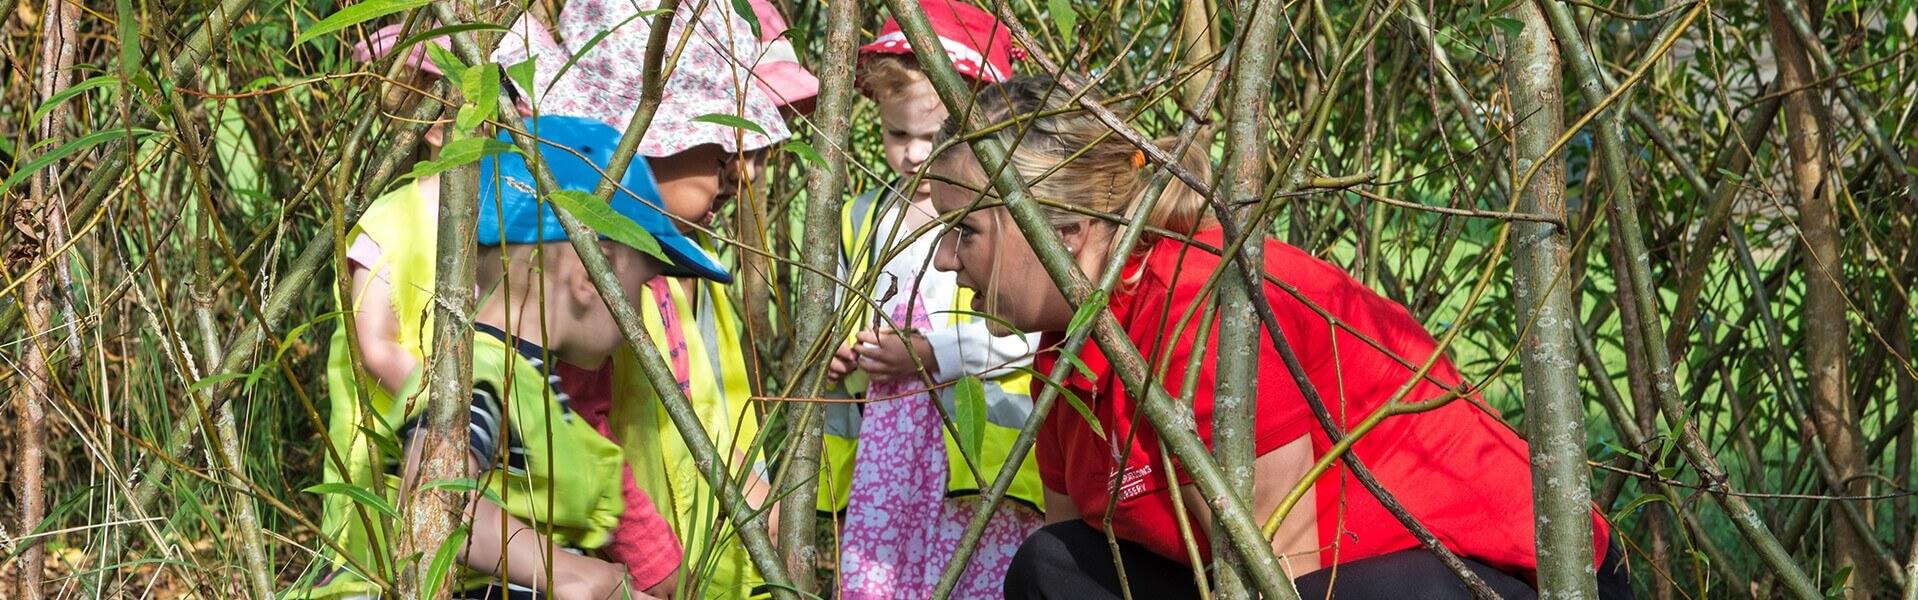 Information for Parents - Nursery Safeguarding policies